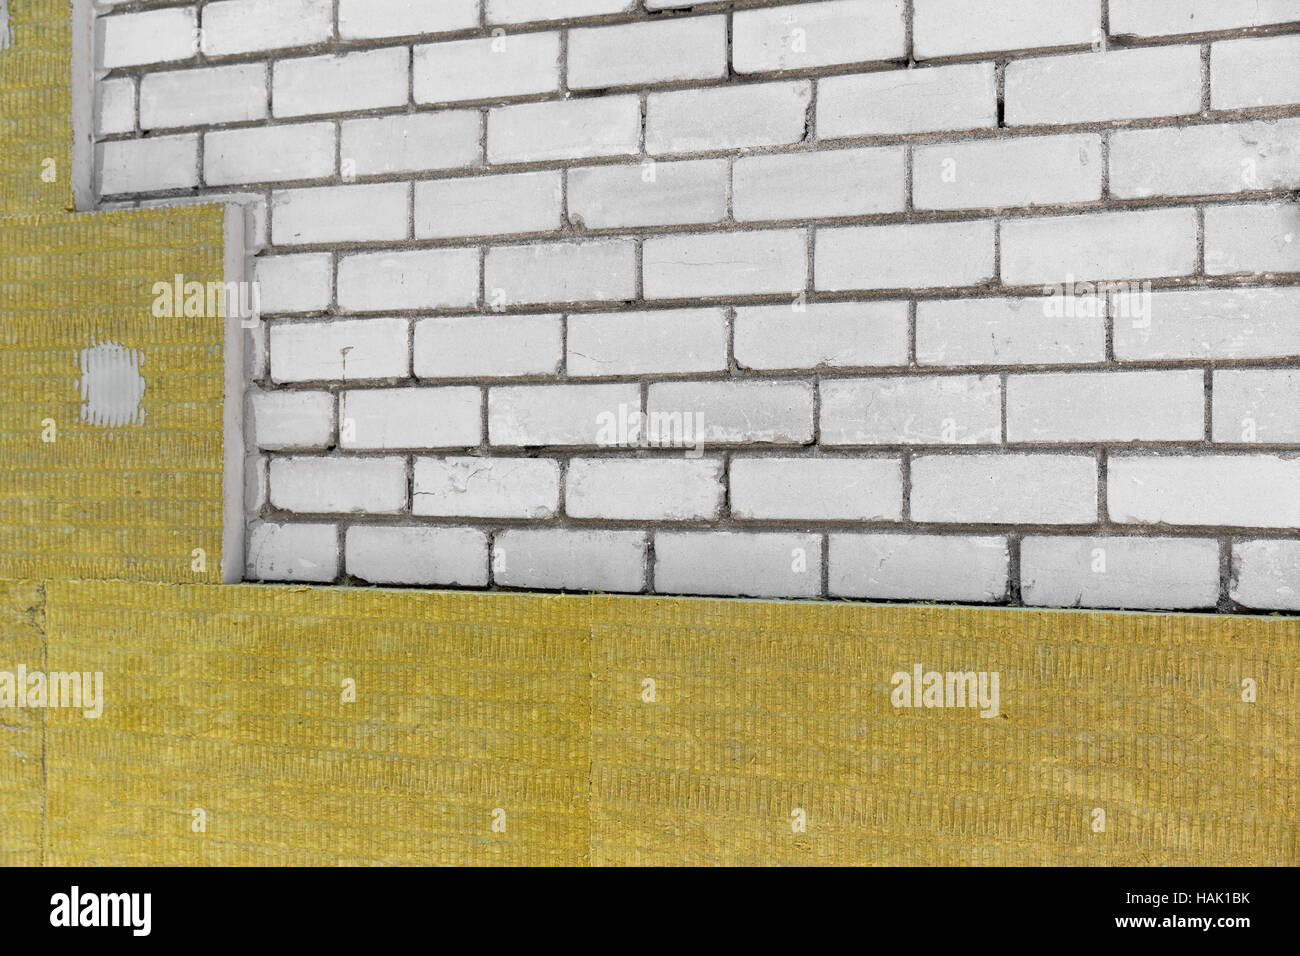 insulating material stockfotos insulating material bilder alamy. Black Bedroom Furniture Sets. Home Design Ideas